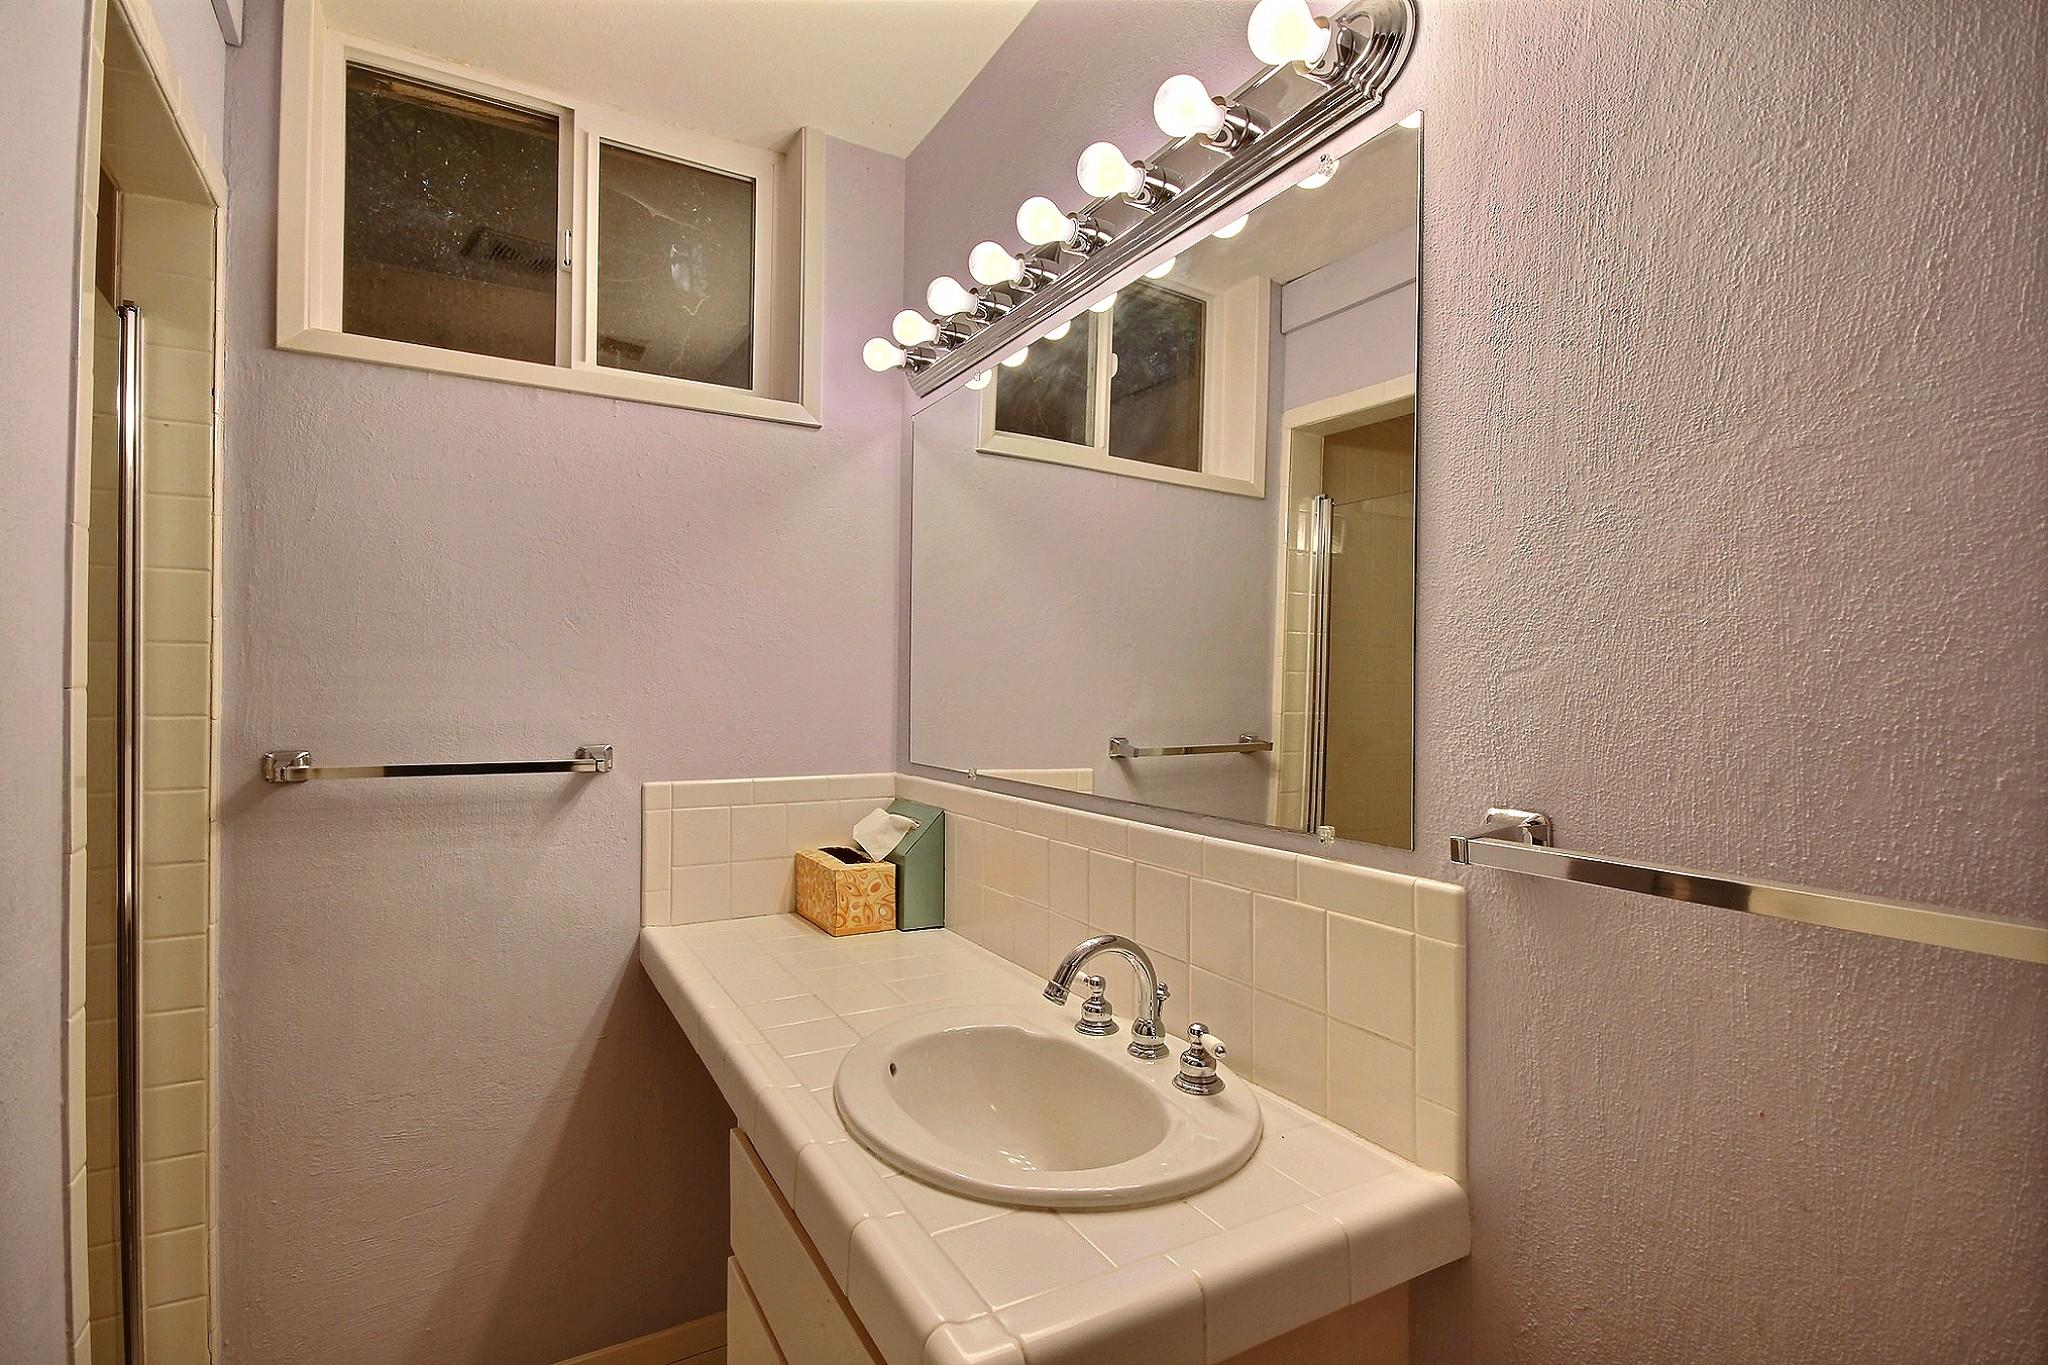 exposio_17_bathroom_2_01_3435_sw_gale_av